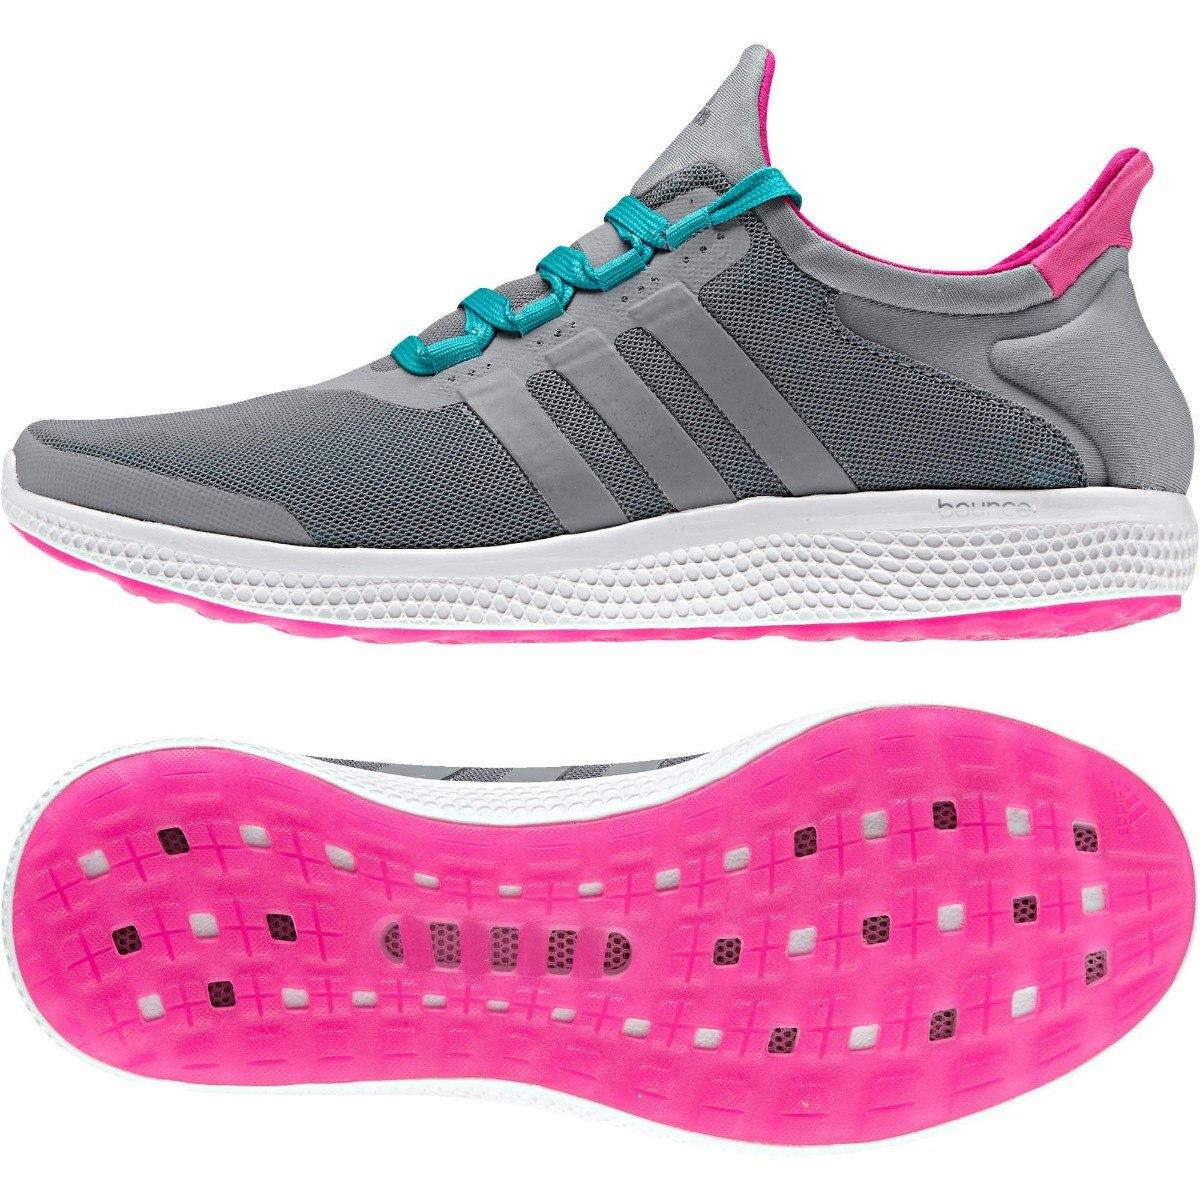 reputable site 0f6d4 f27c6 zapatos deportivos damas adidas cc sonic - talla 42 23. Cargando zoom.